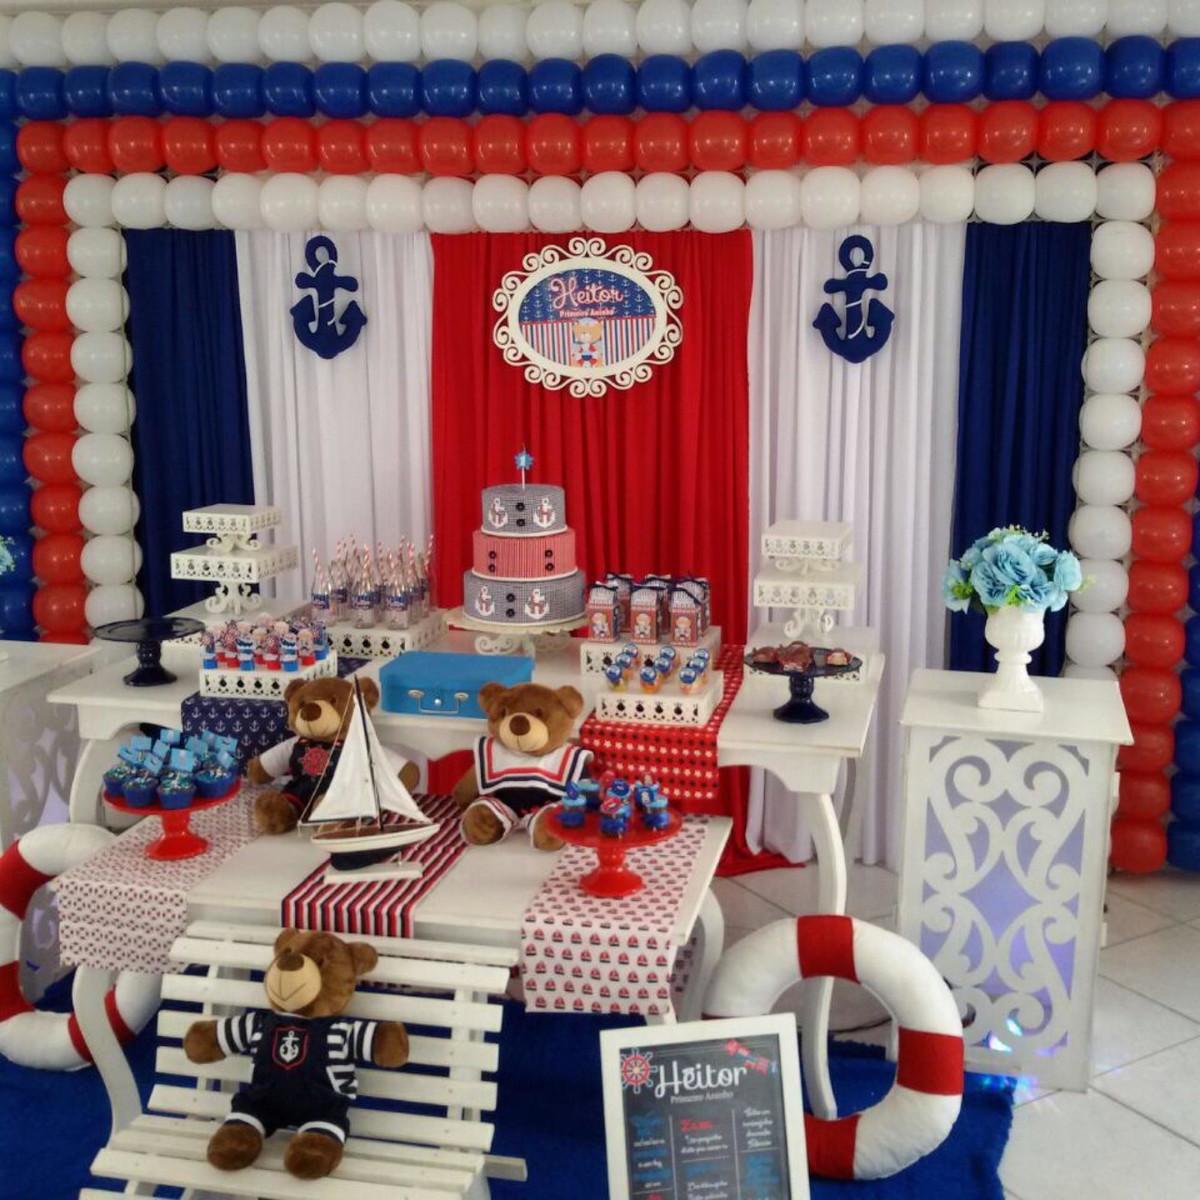 Festa marinheiro no elo7 bellana decorao 8d5913 zoom festa marinheiro thecheapjerseys Gallery